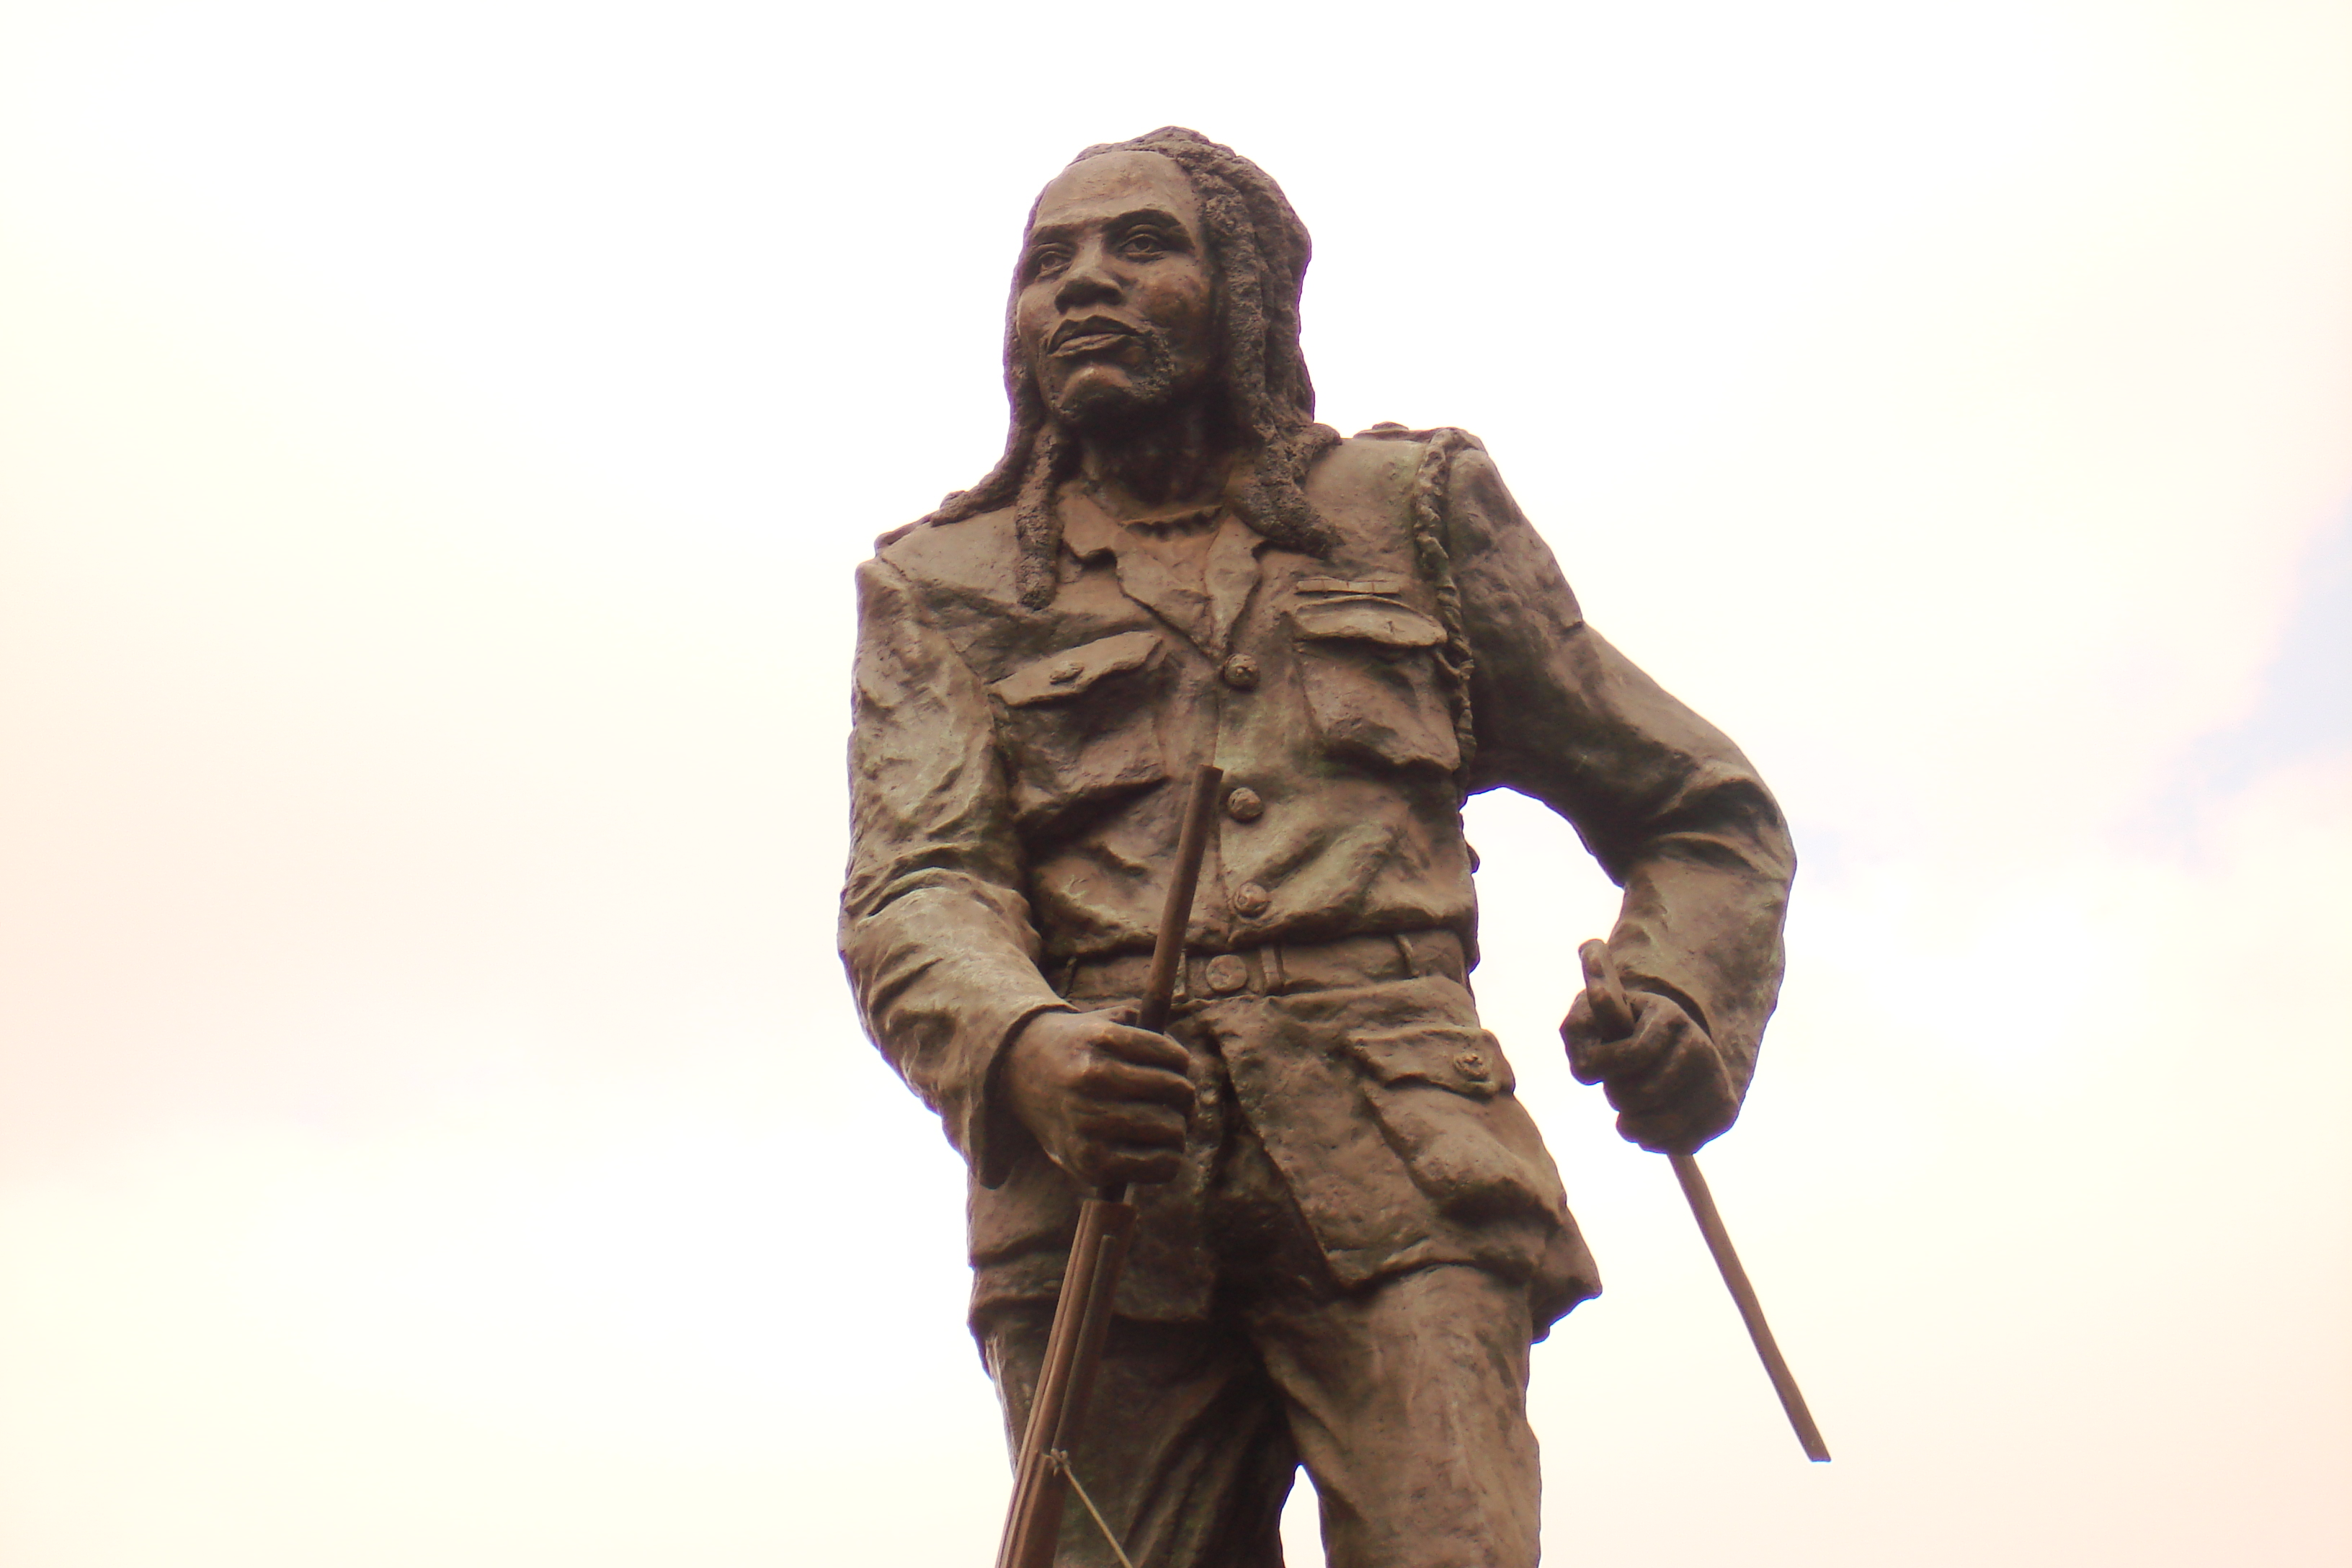 Statue_of_Dedan_Kimathi_Nairobi,_Kenya